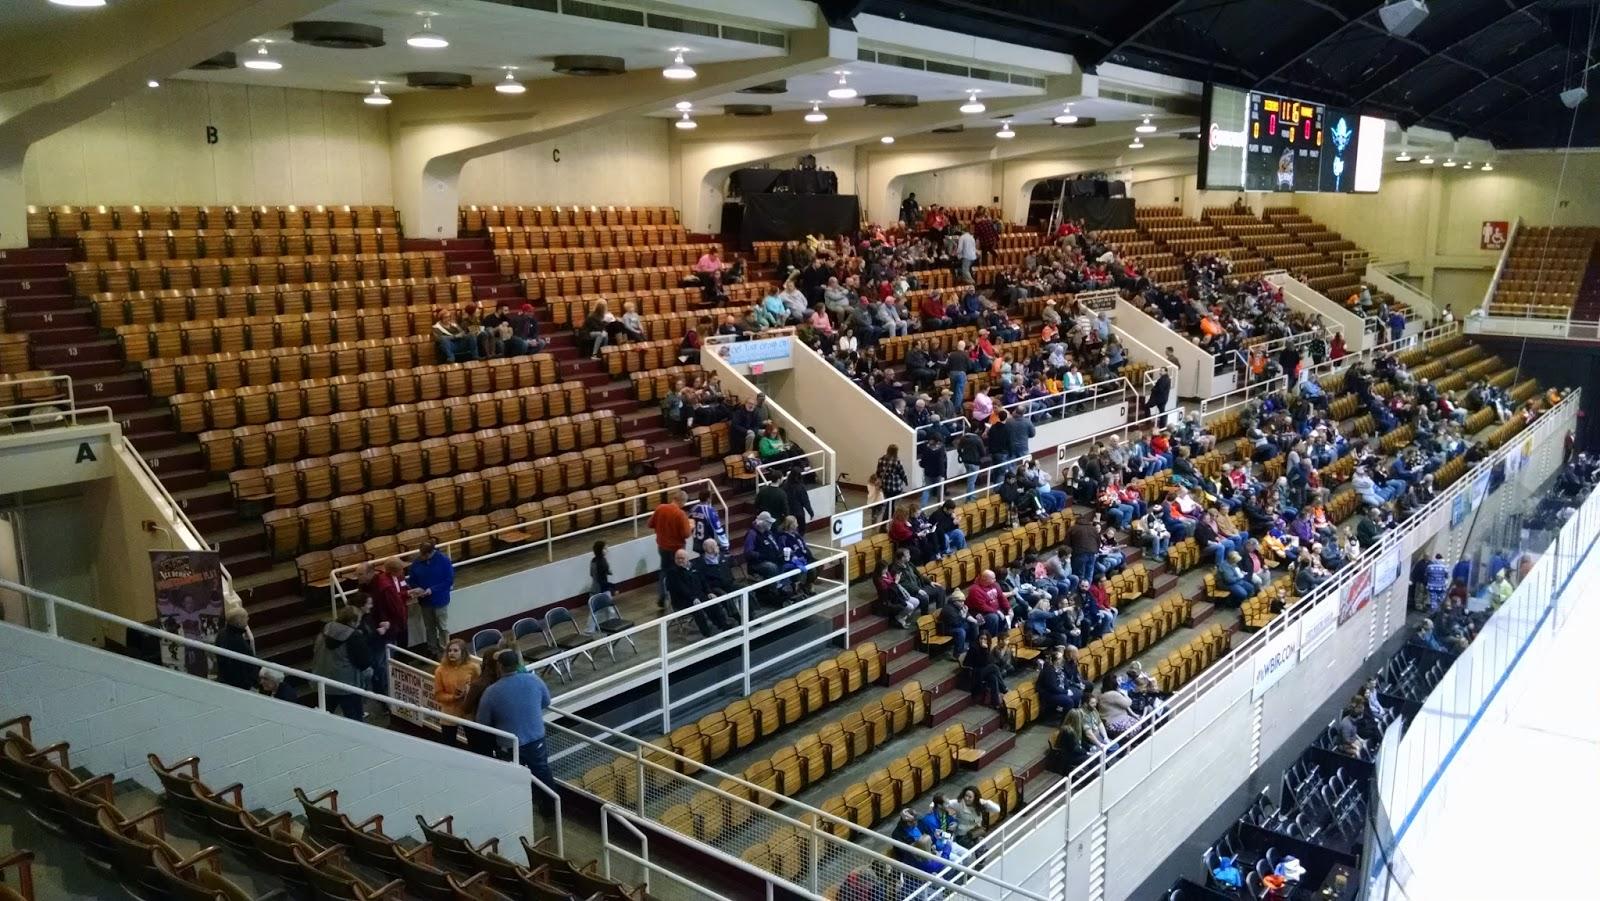 Tn Knoxville Civic Auditorium Coliseum